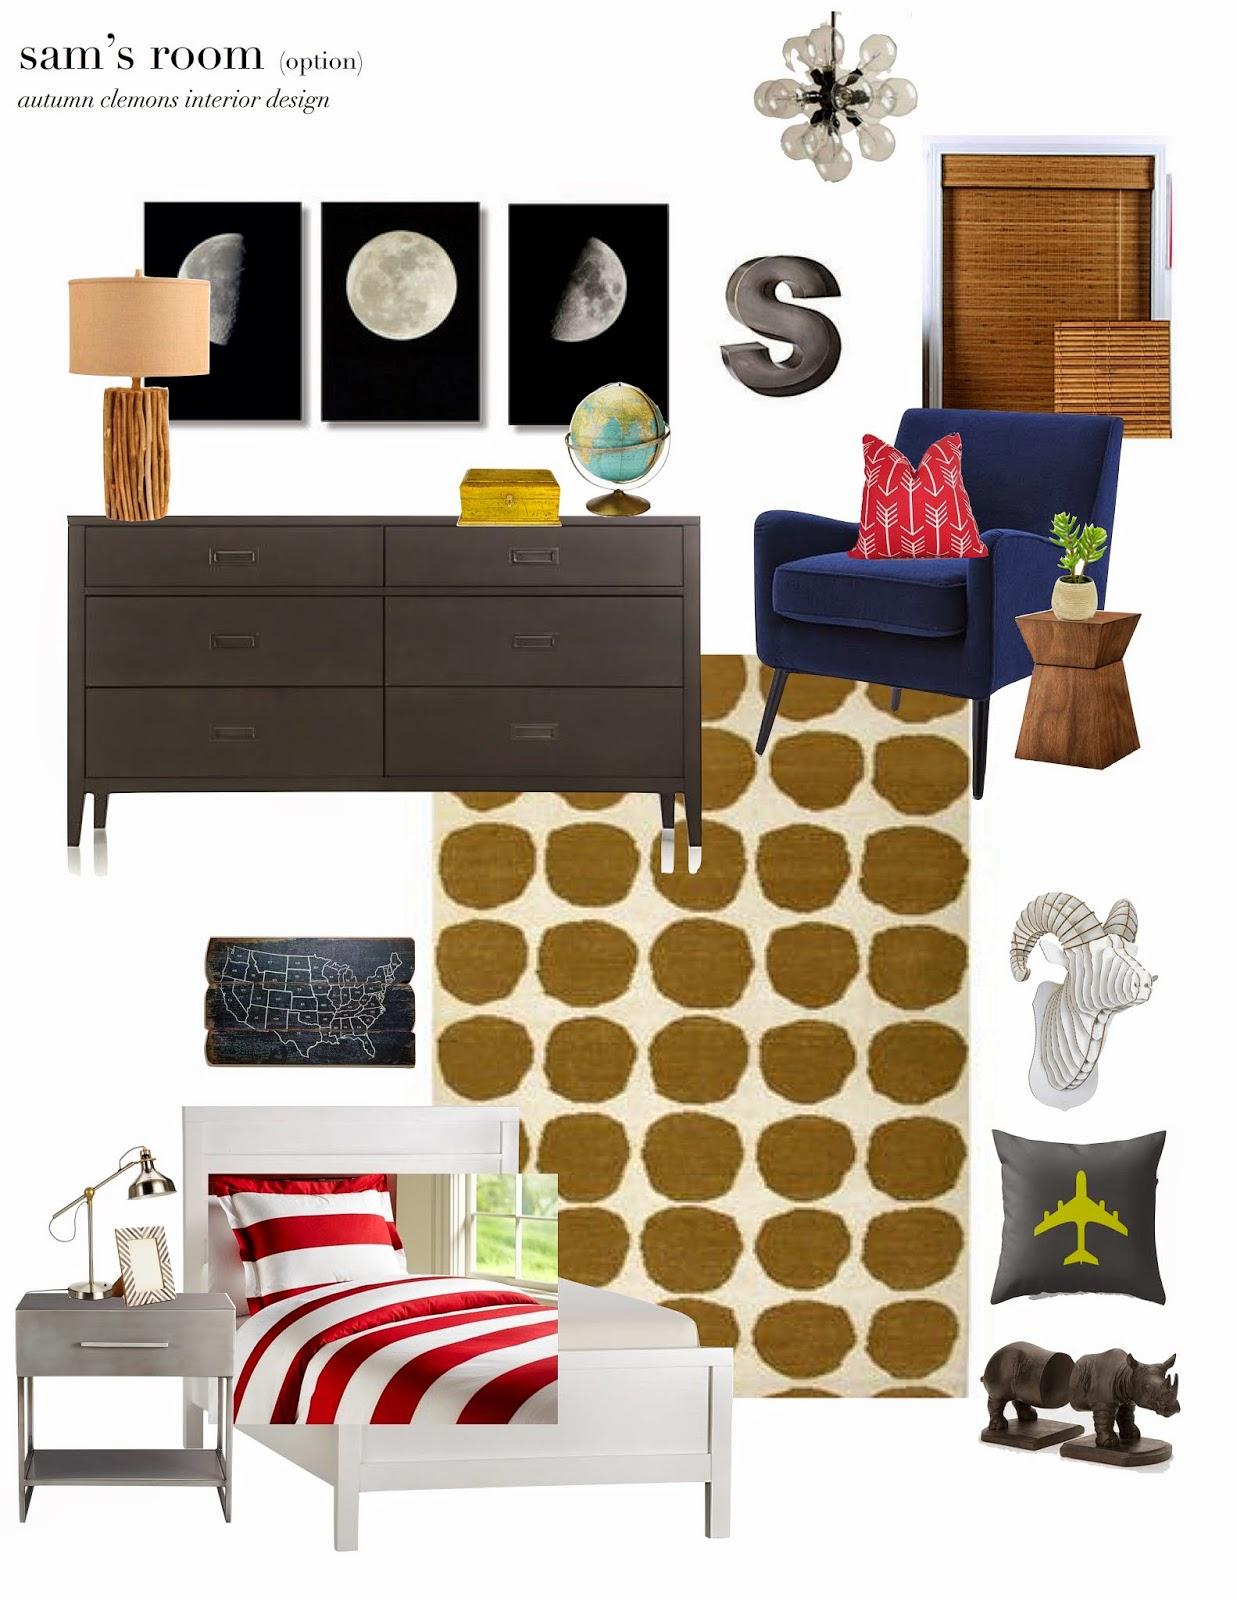 Room Design Program: Design Dump: Boys Room- Design Plan, TWO Ways